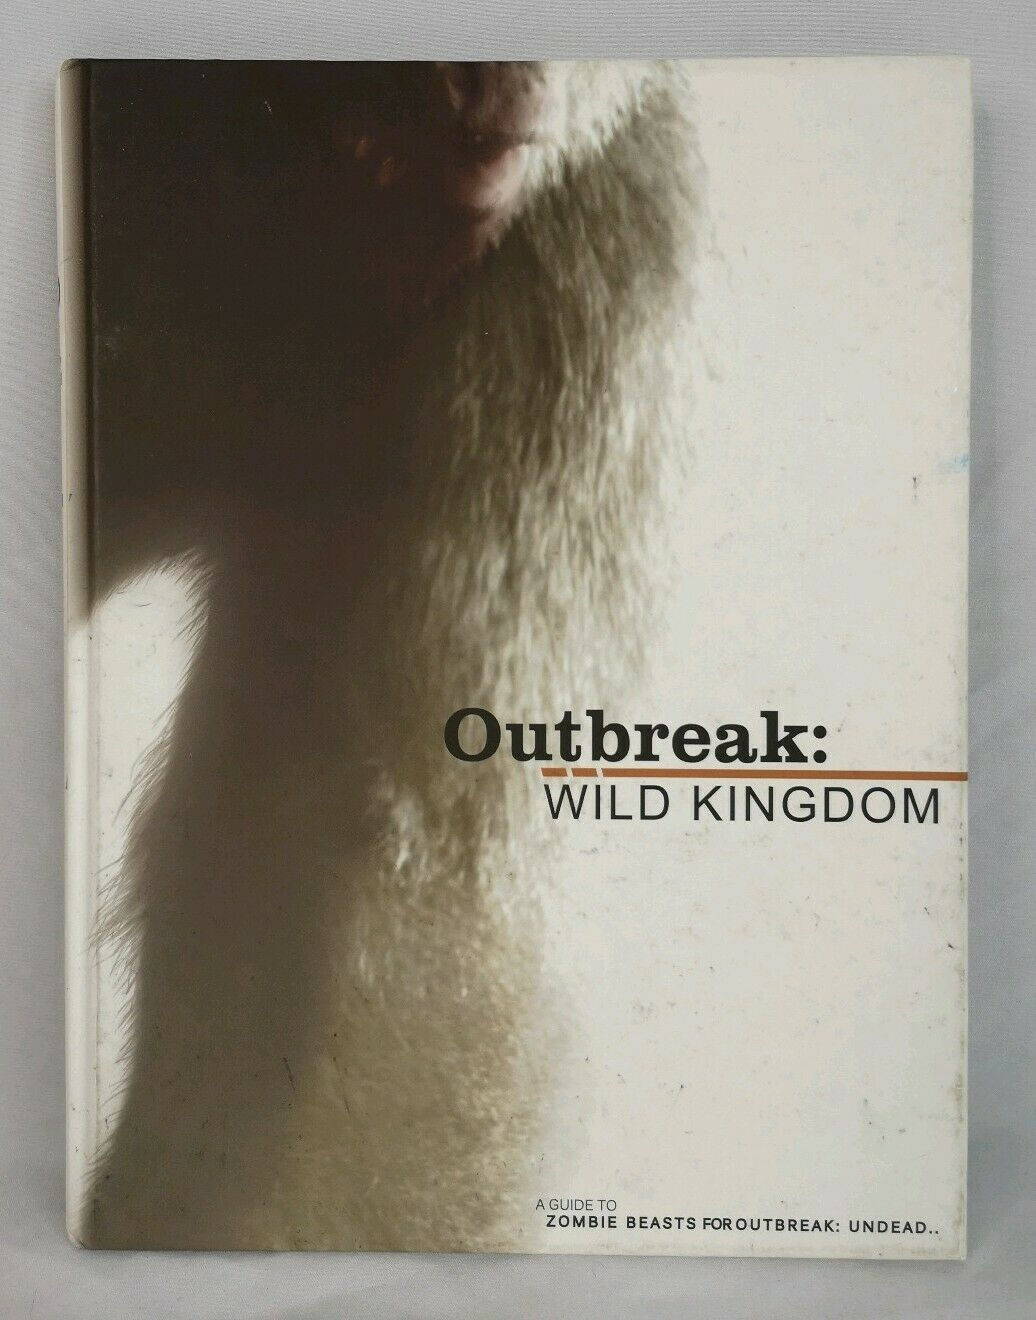 Outbreak Undead Wild Kingdom Zombie Beasts Horror RPG Hardcover Book